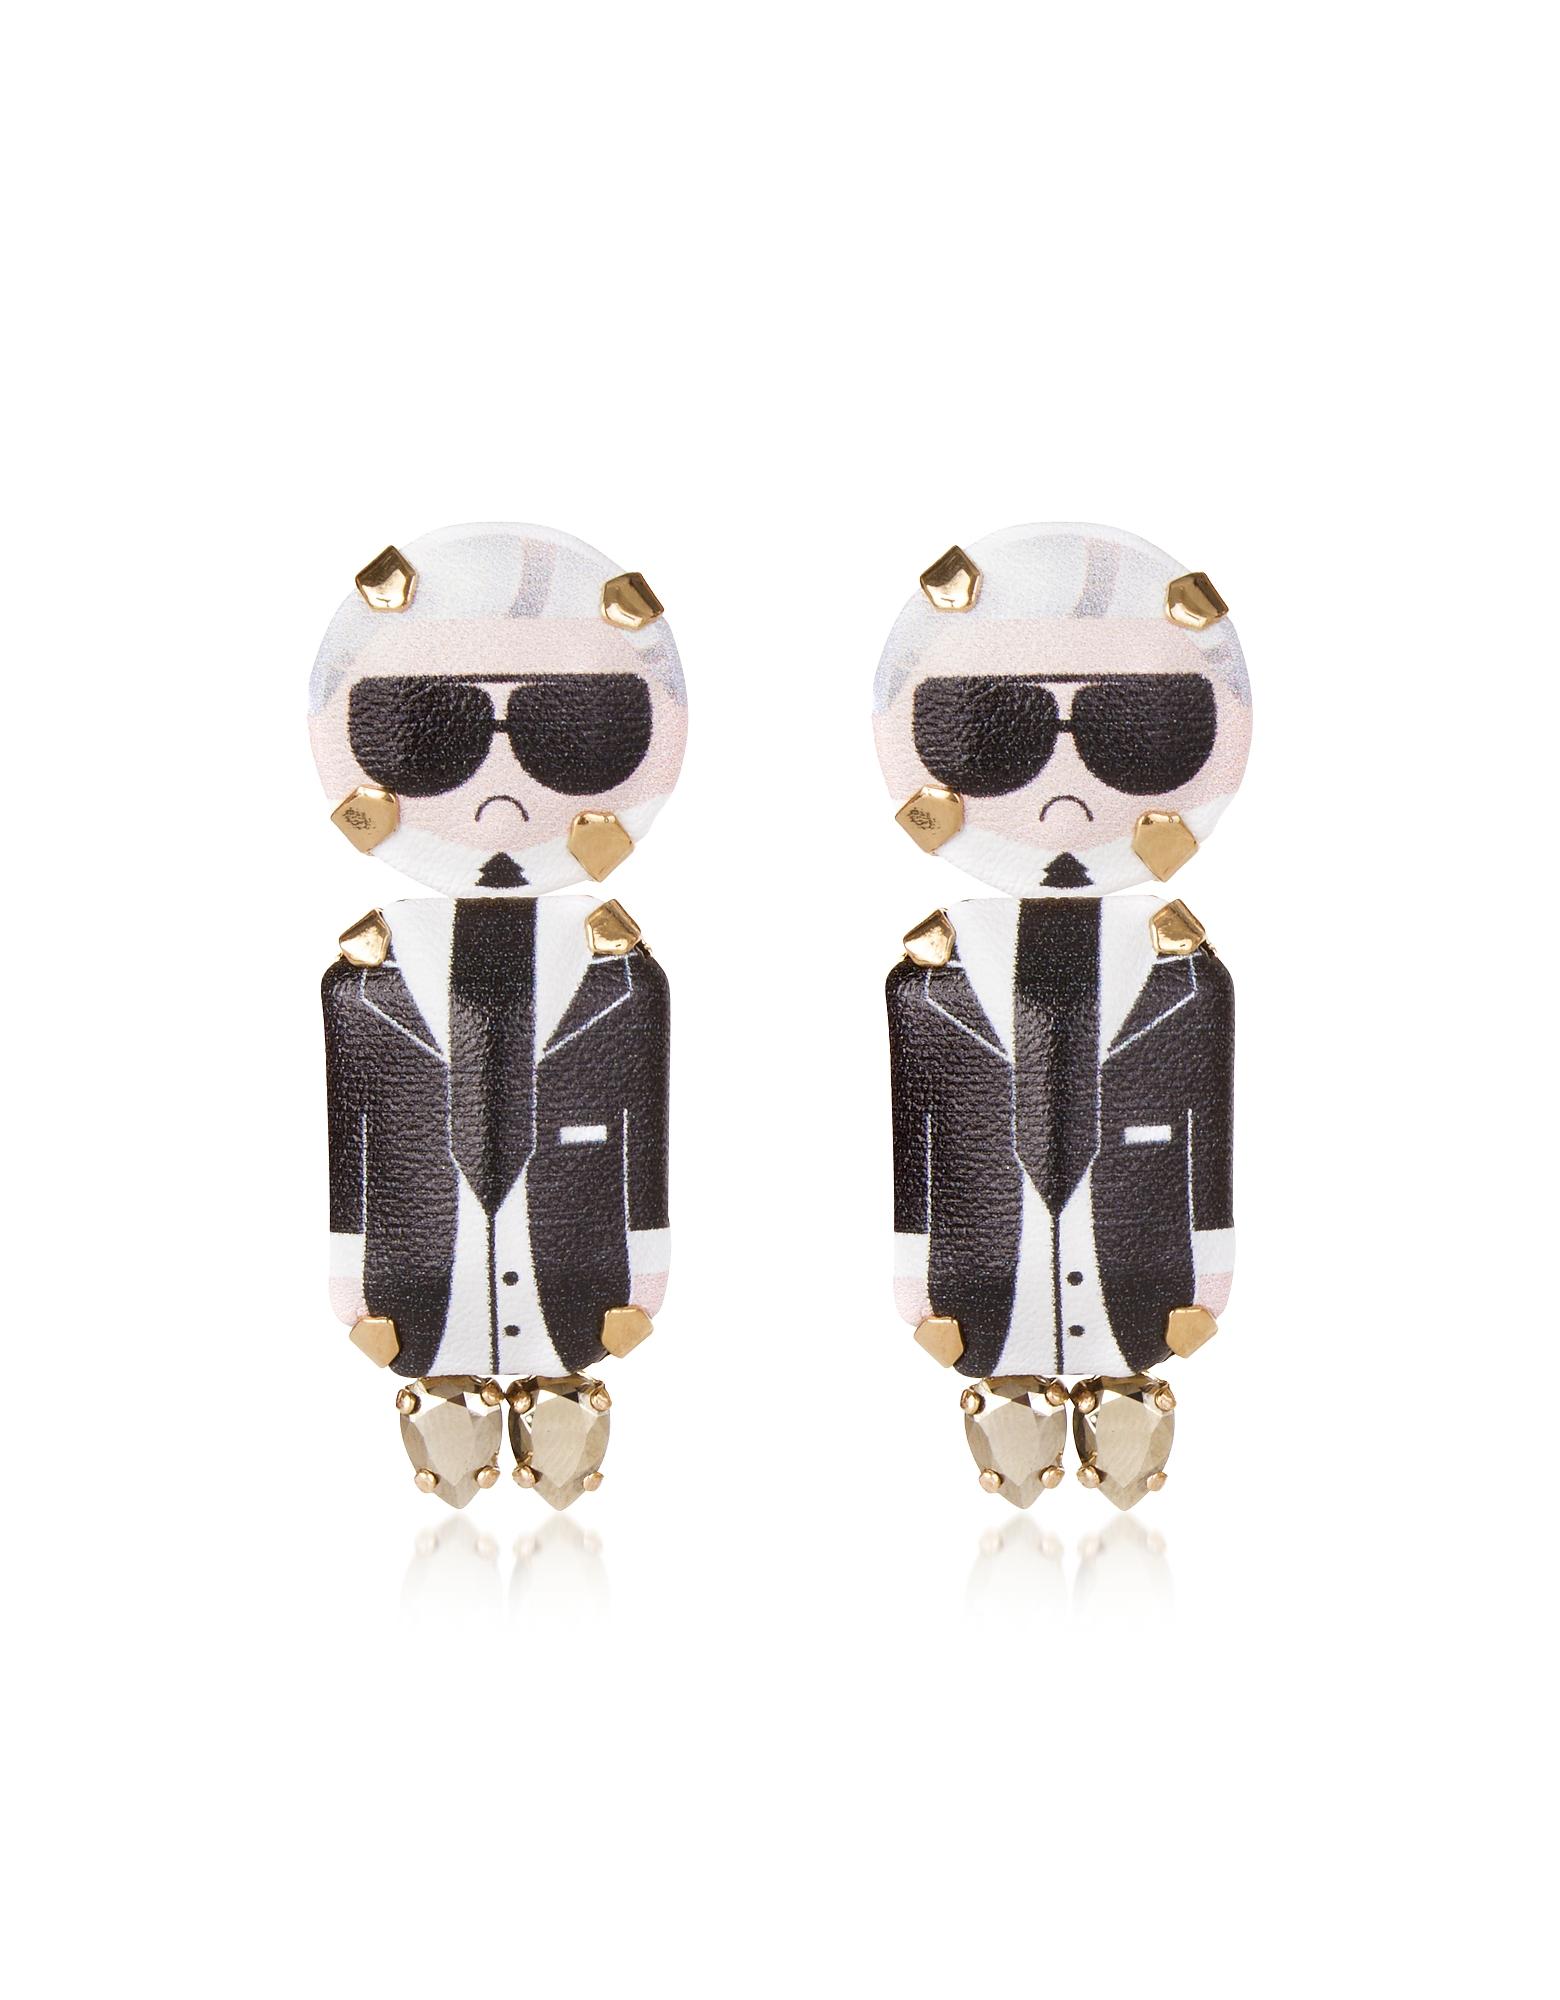 Karl Pendant Earrings, Black